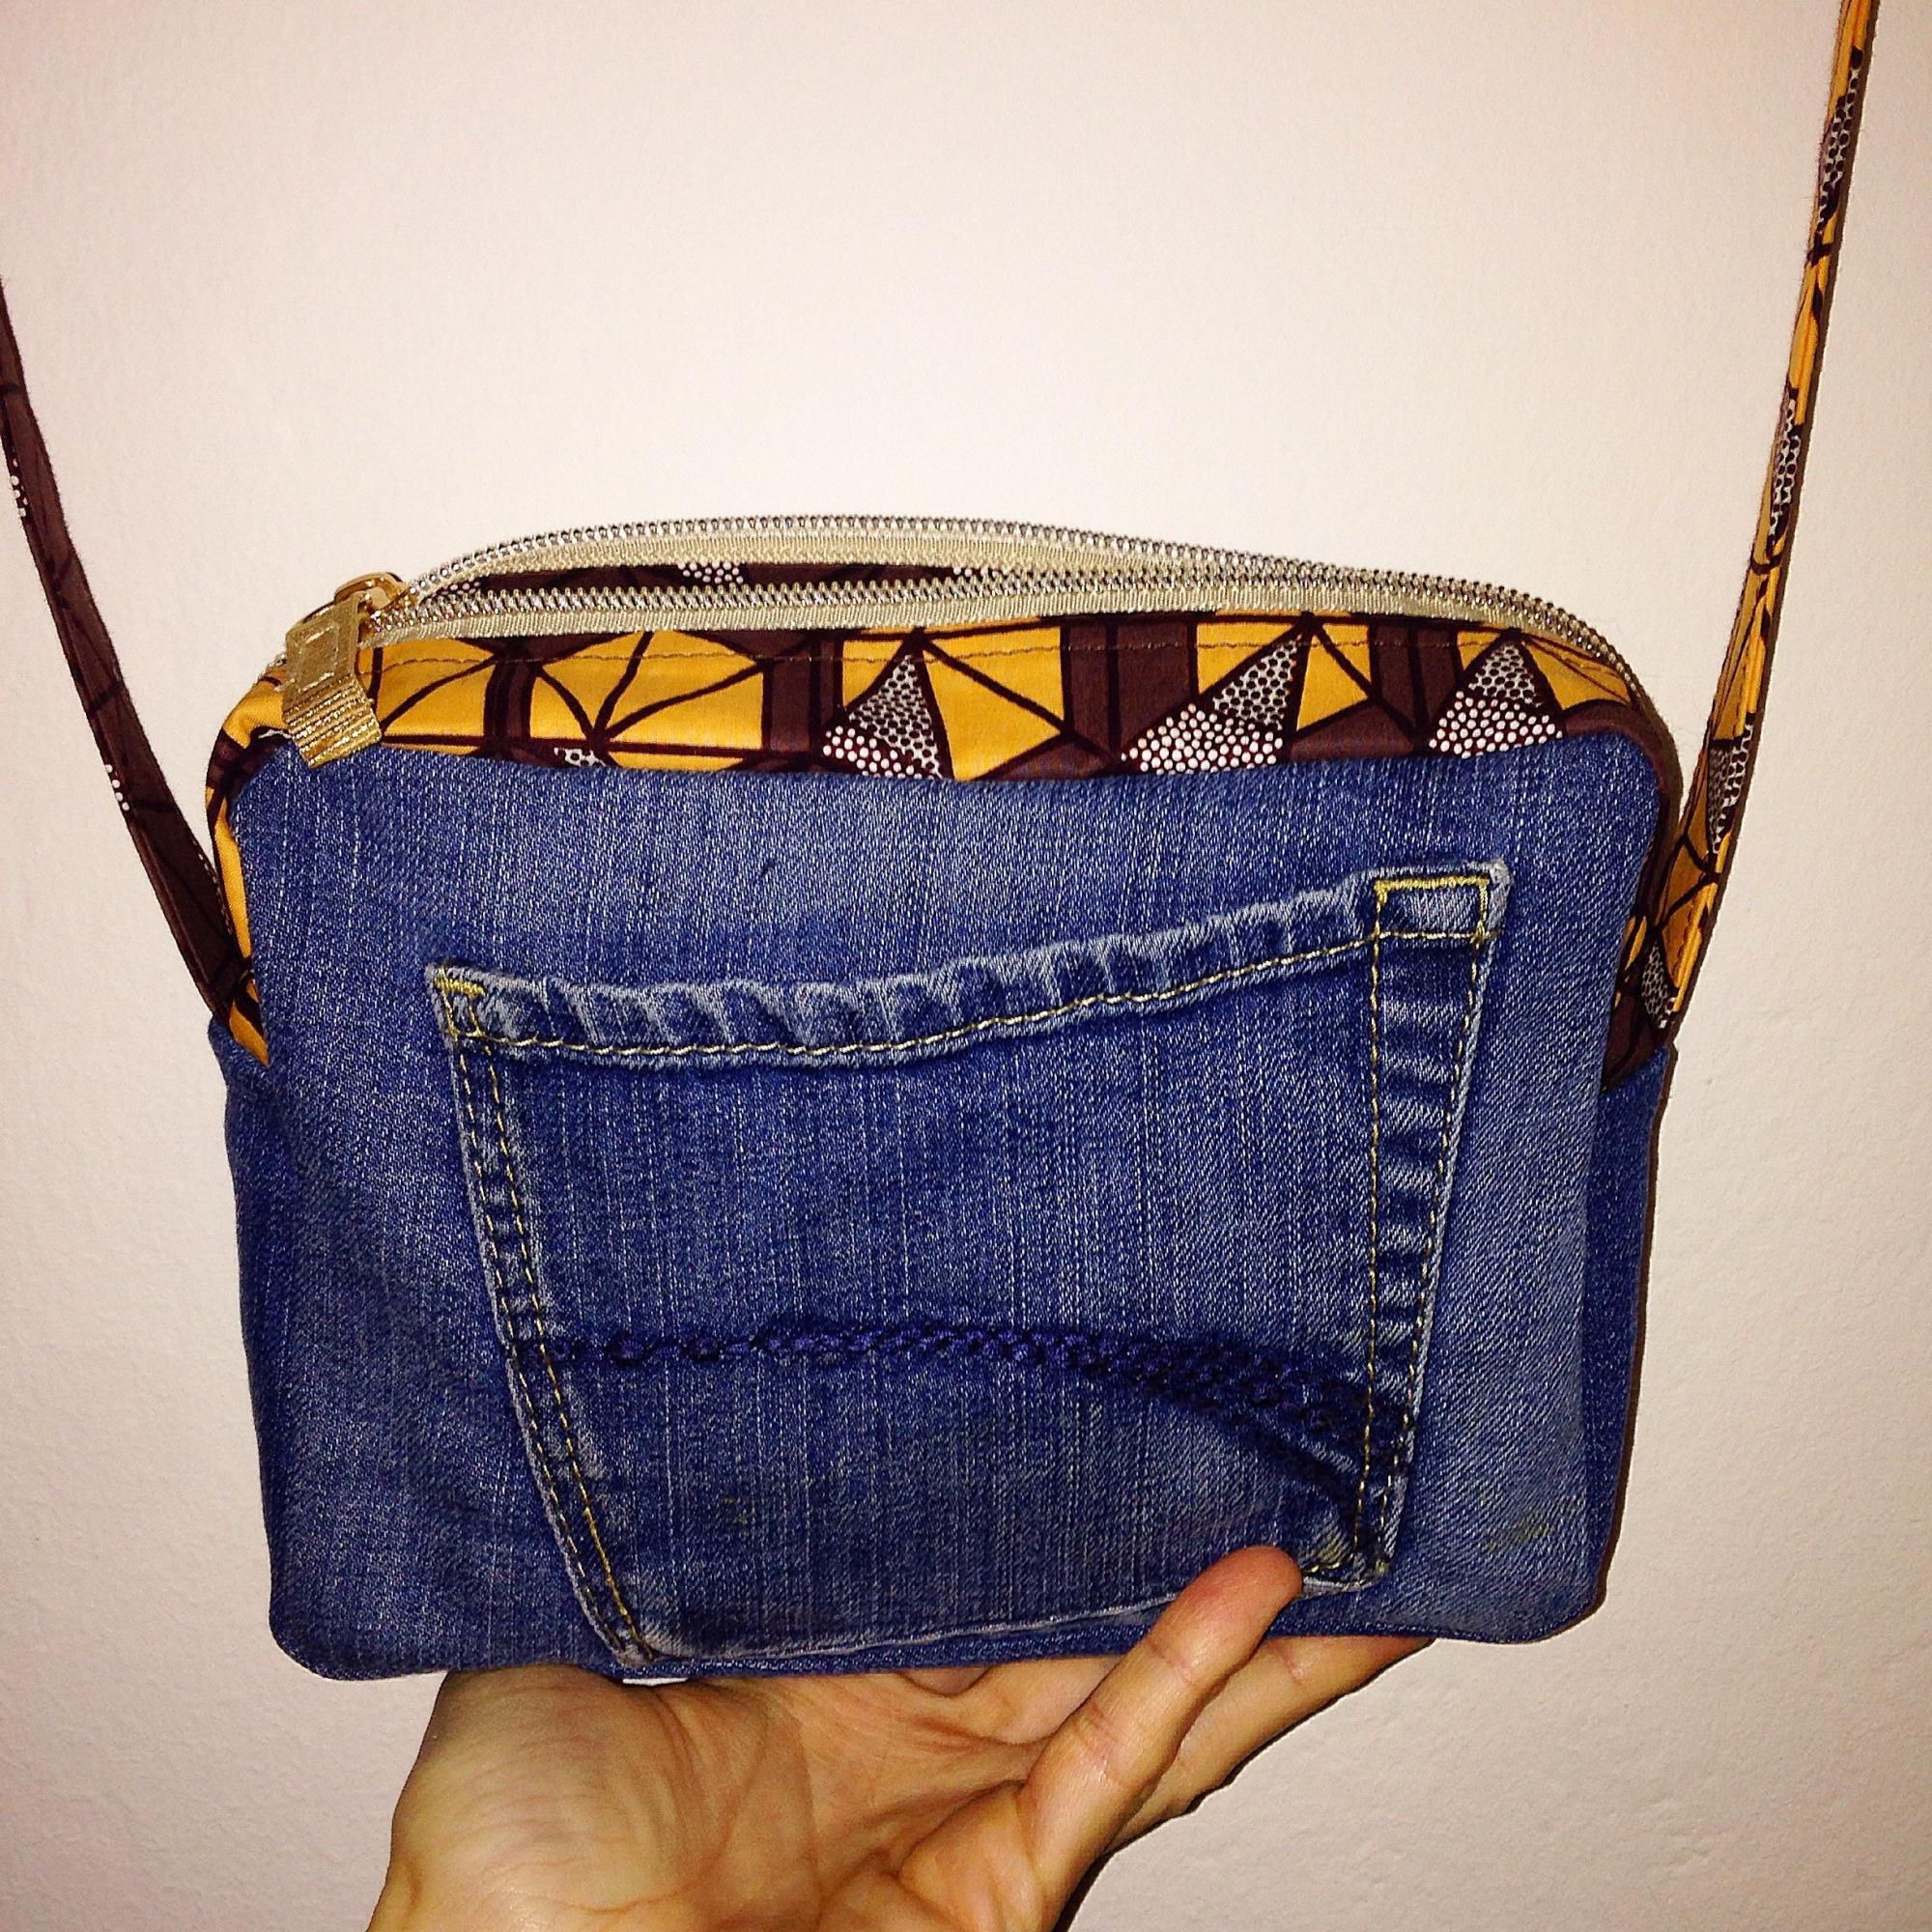 Petite besace en jeans et tissu africain